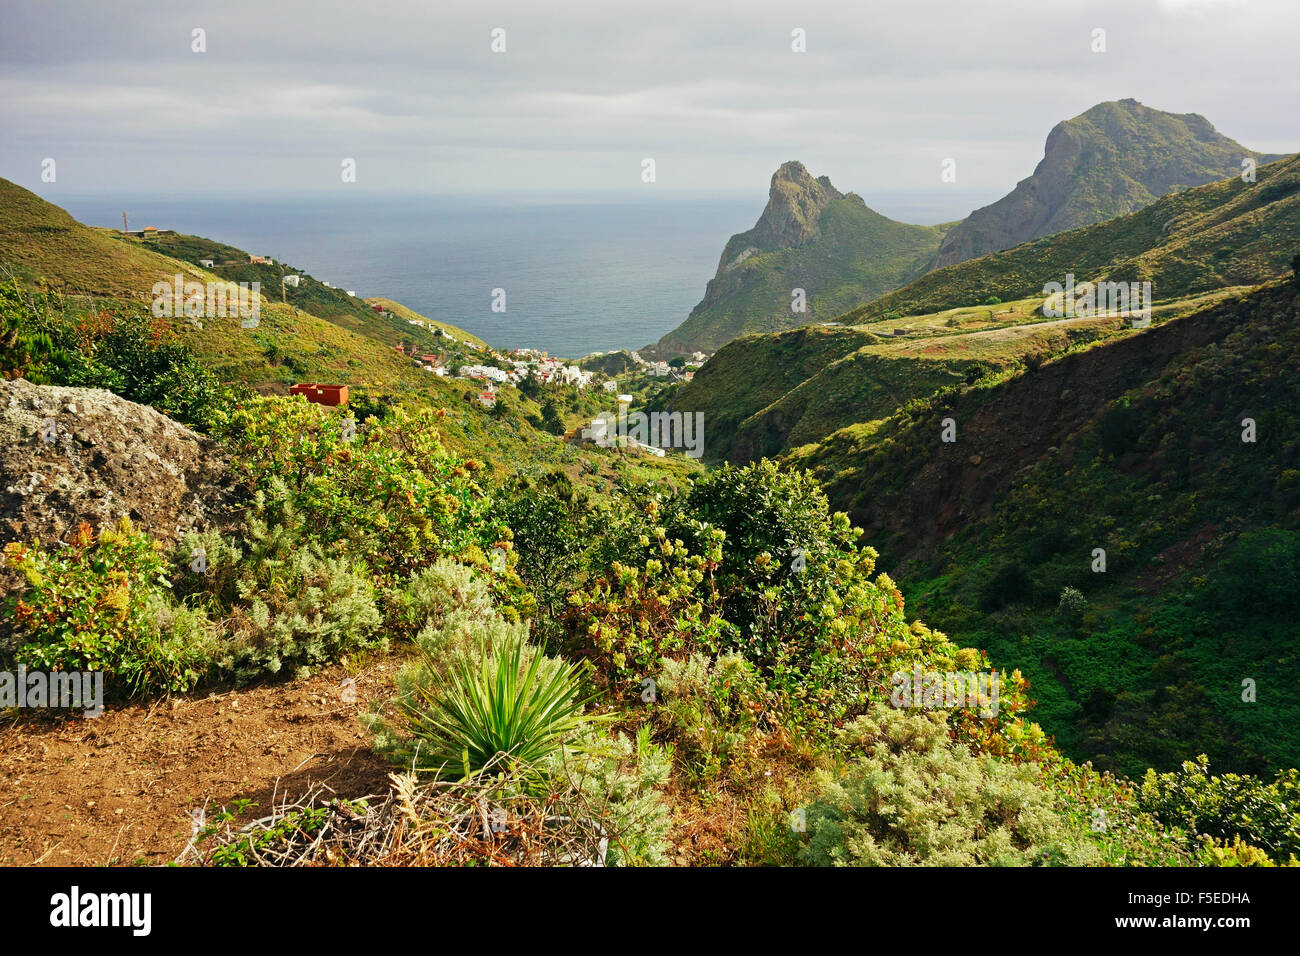 Taganana Dorf, Anaga-Gebirge, Teneriffa, Kanarische Inseln, Spanien, Atlantik, EuropaStockfoto